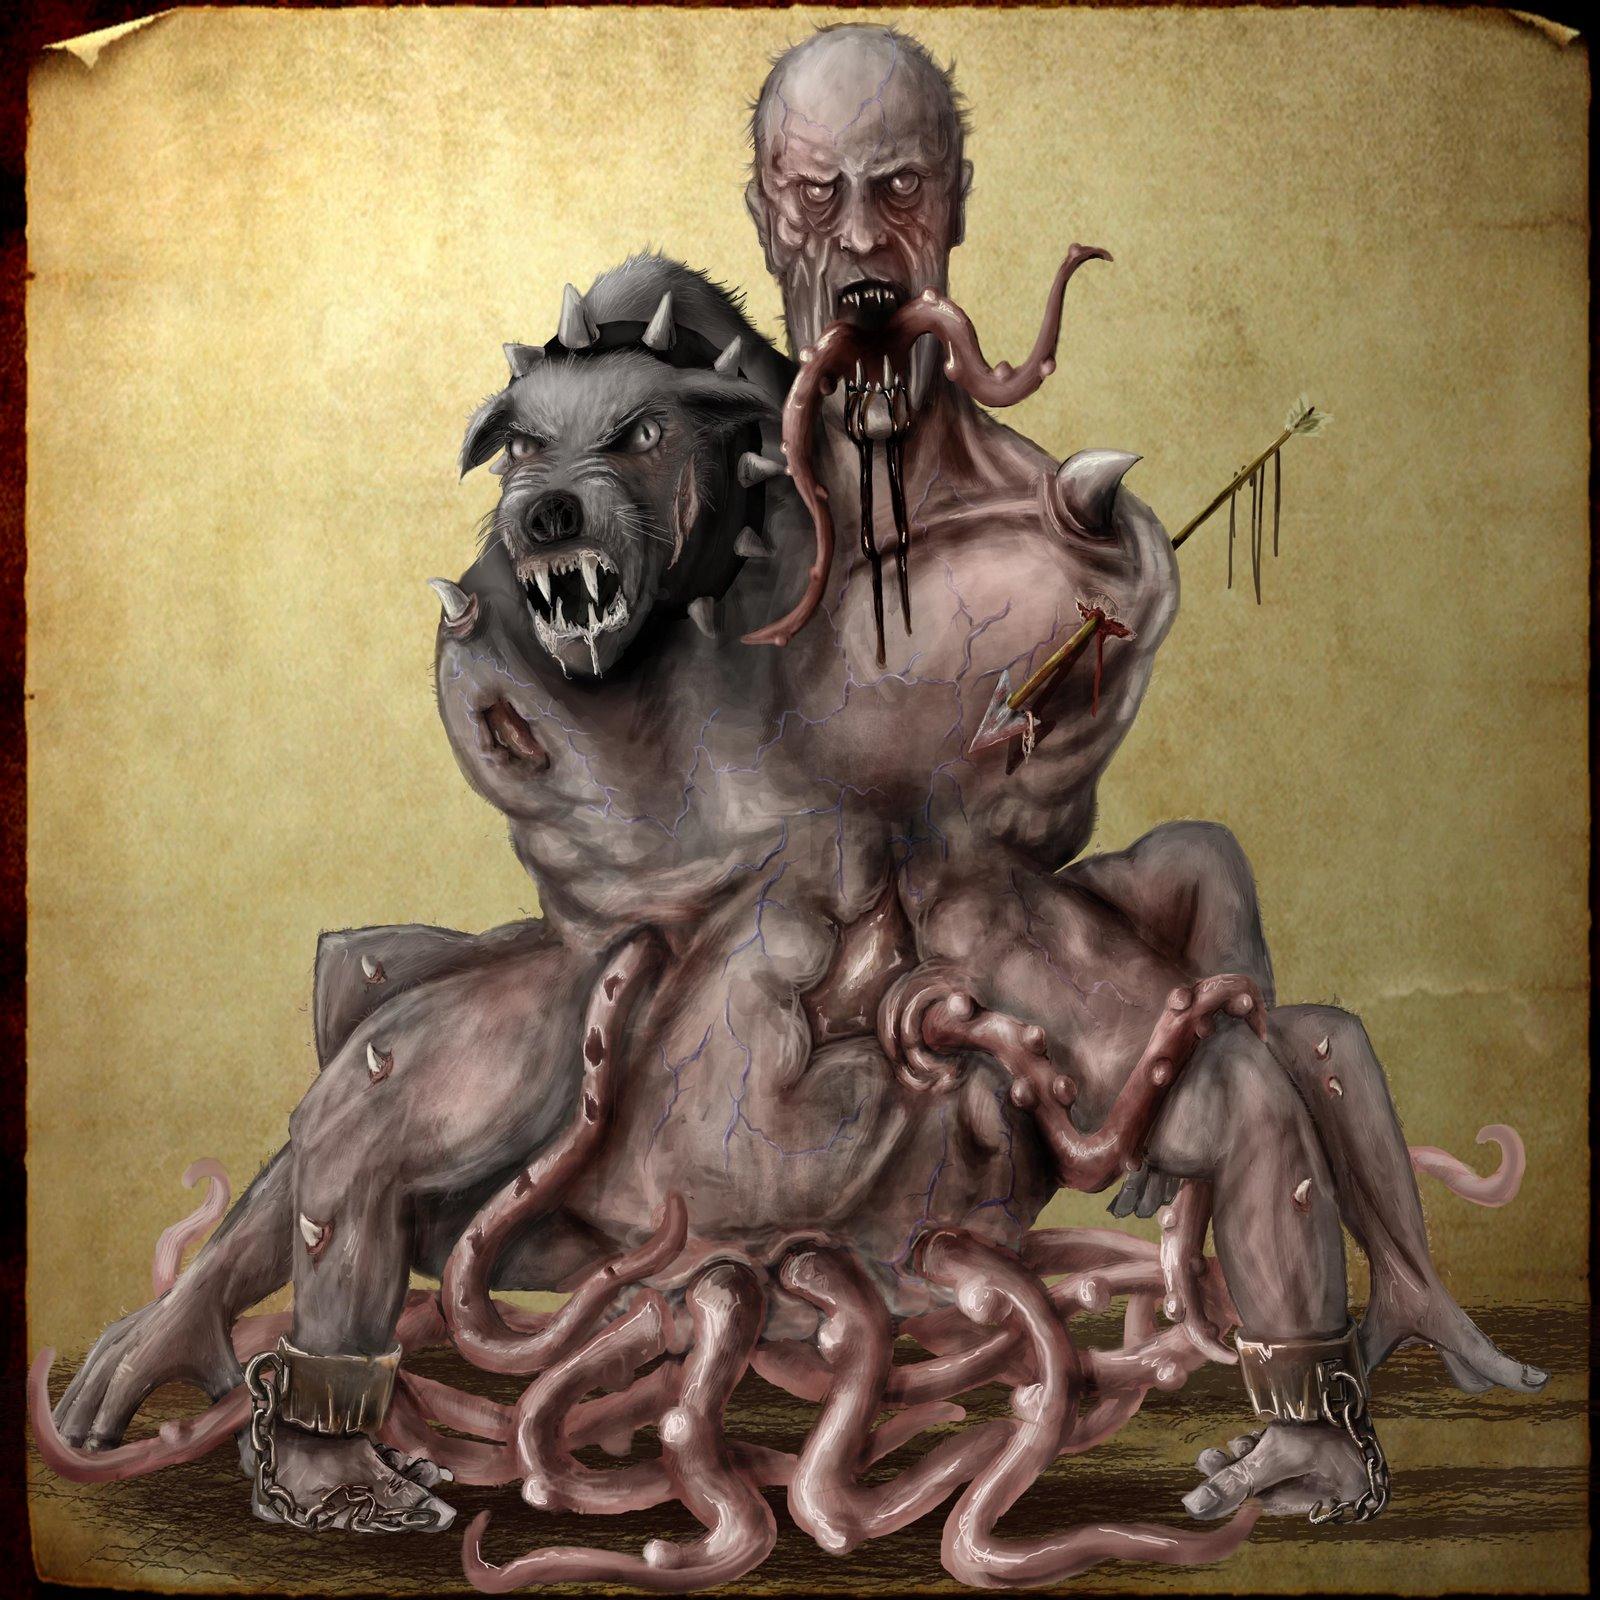 Fallout new vegas unethical deeds mod 2 - 2 part 1